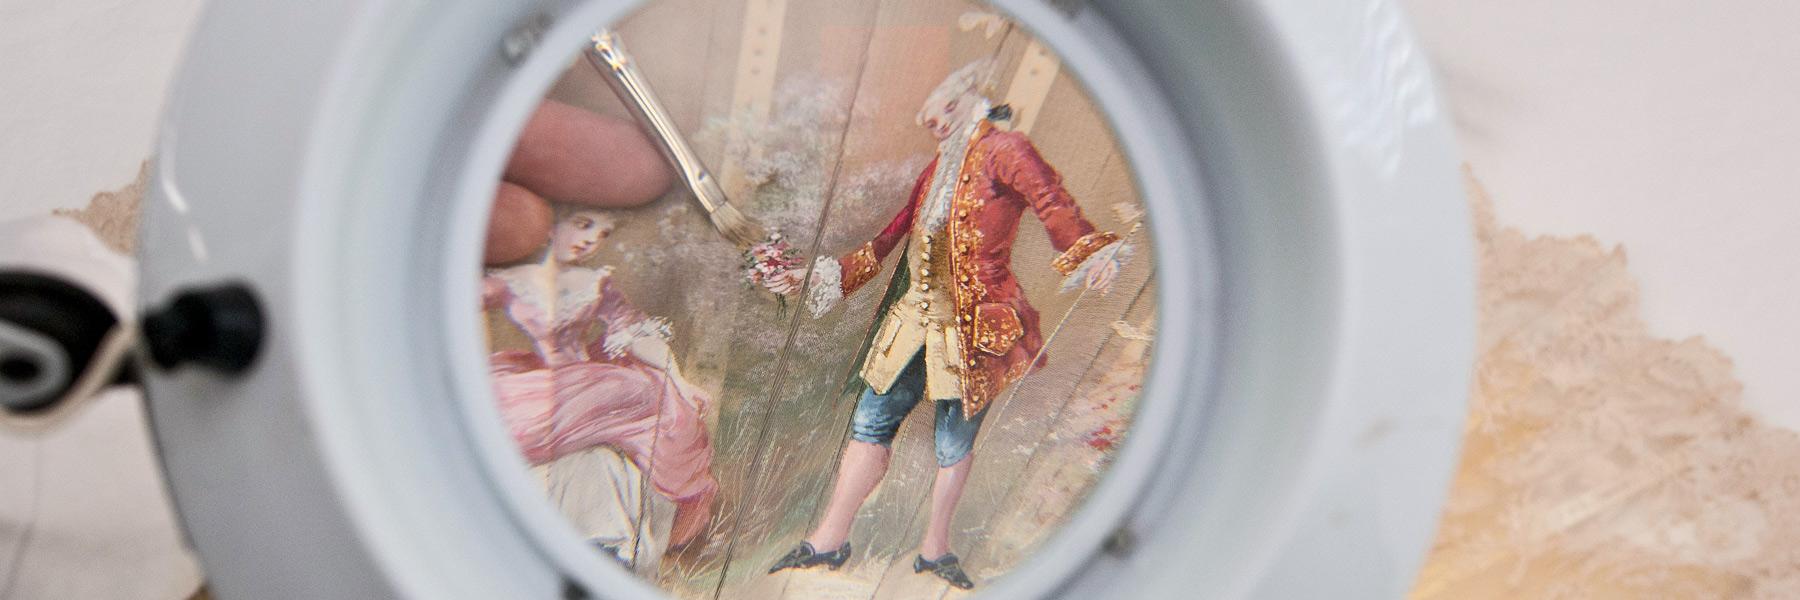 Slider imatge detall taller de restauració.